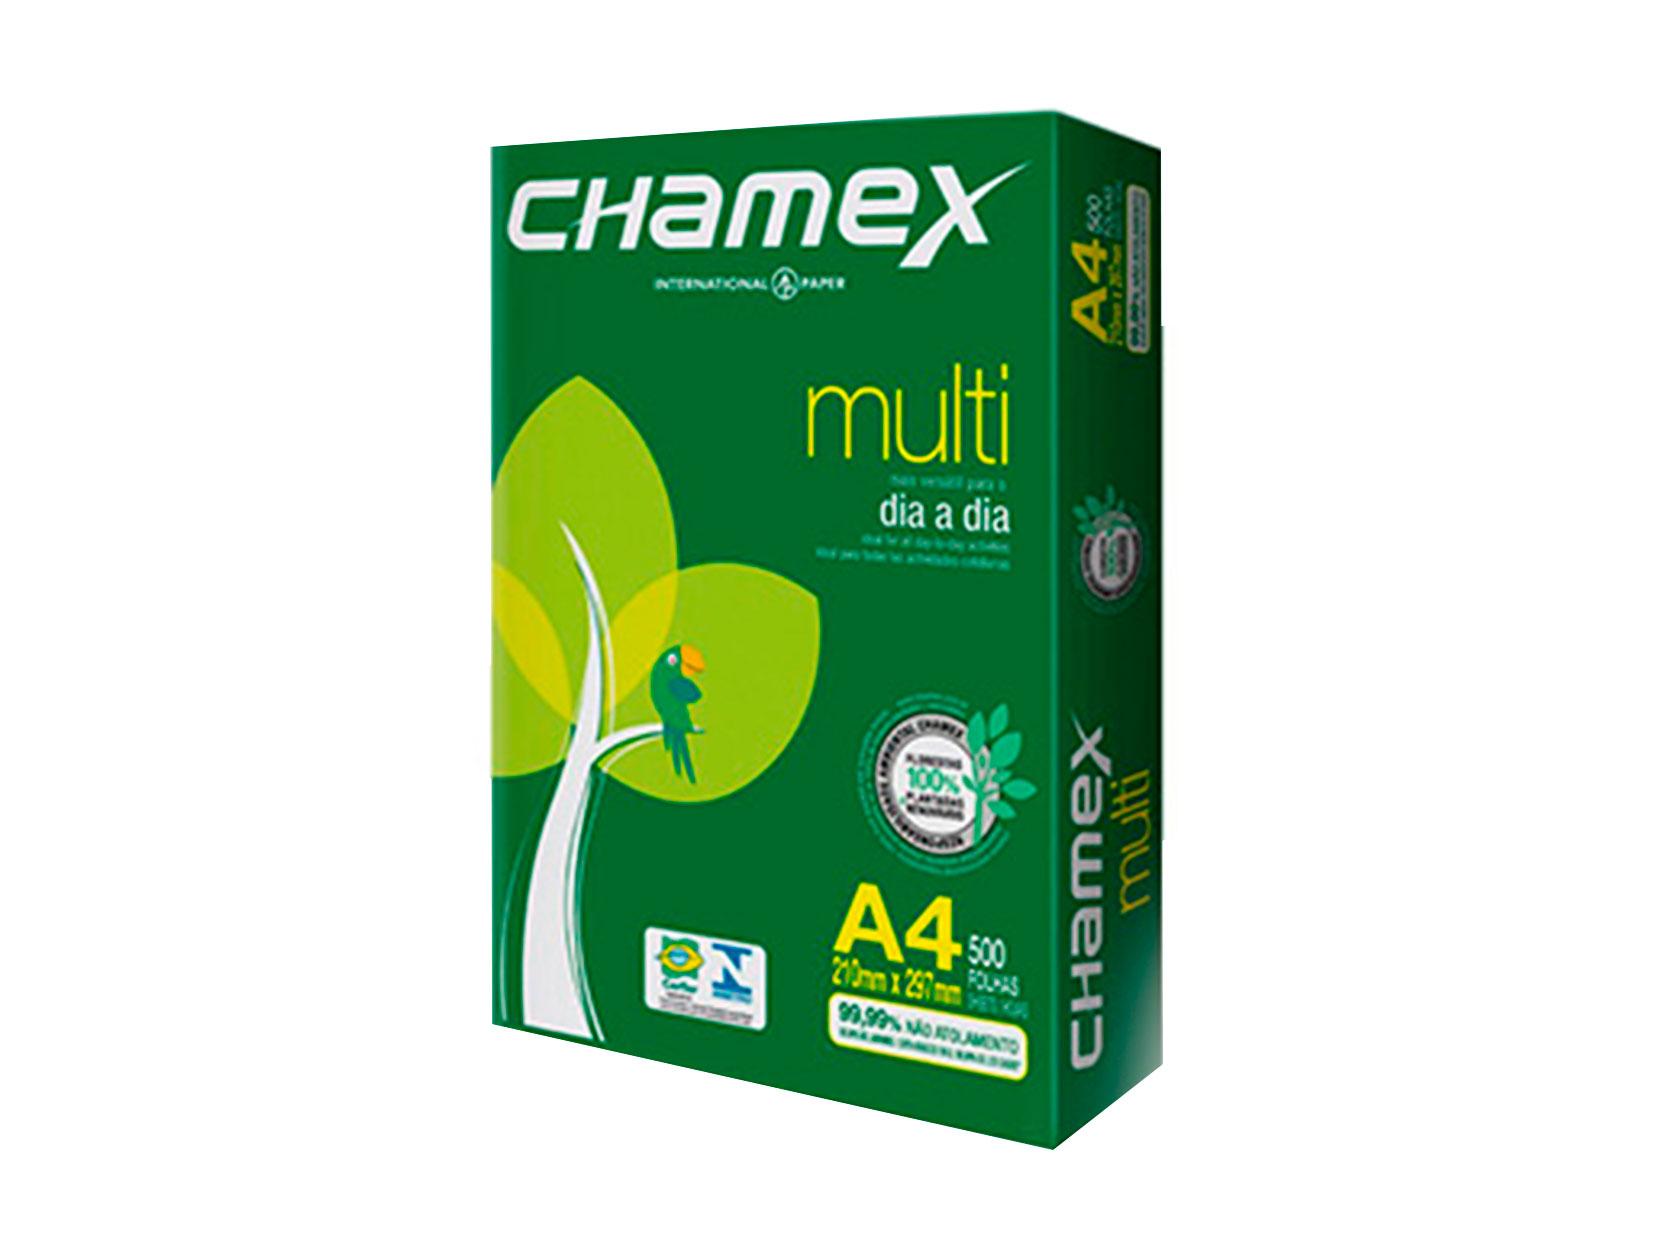 PAPEL BOND 40 CHAMEX A4